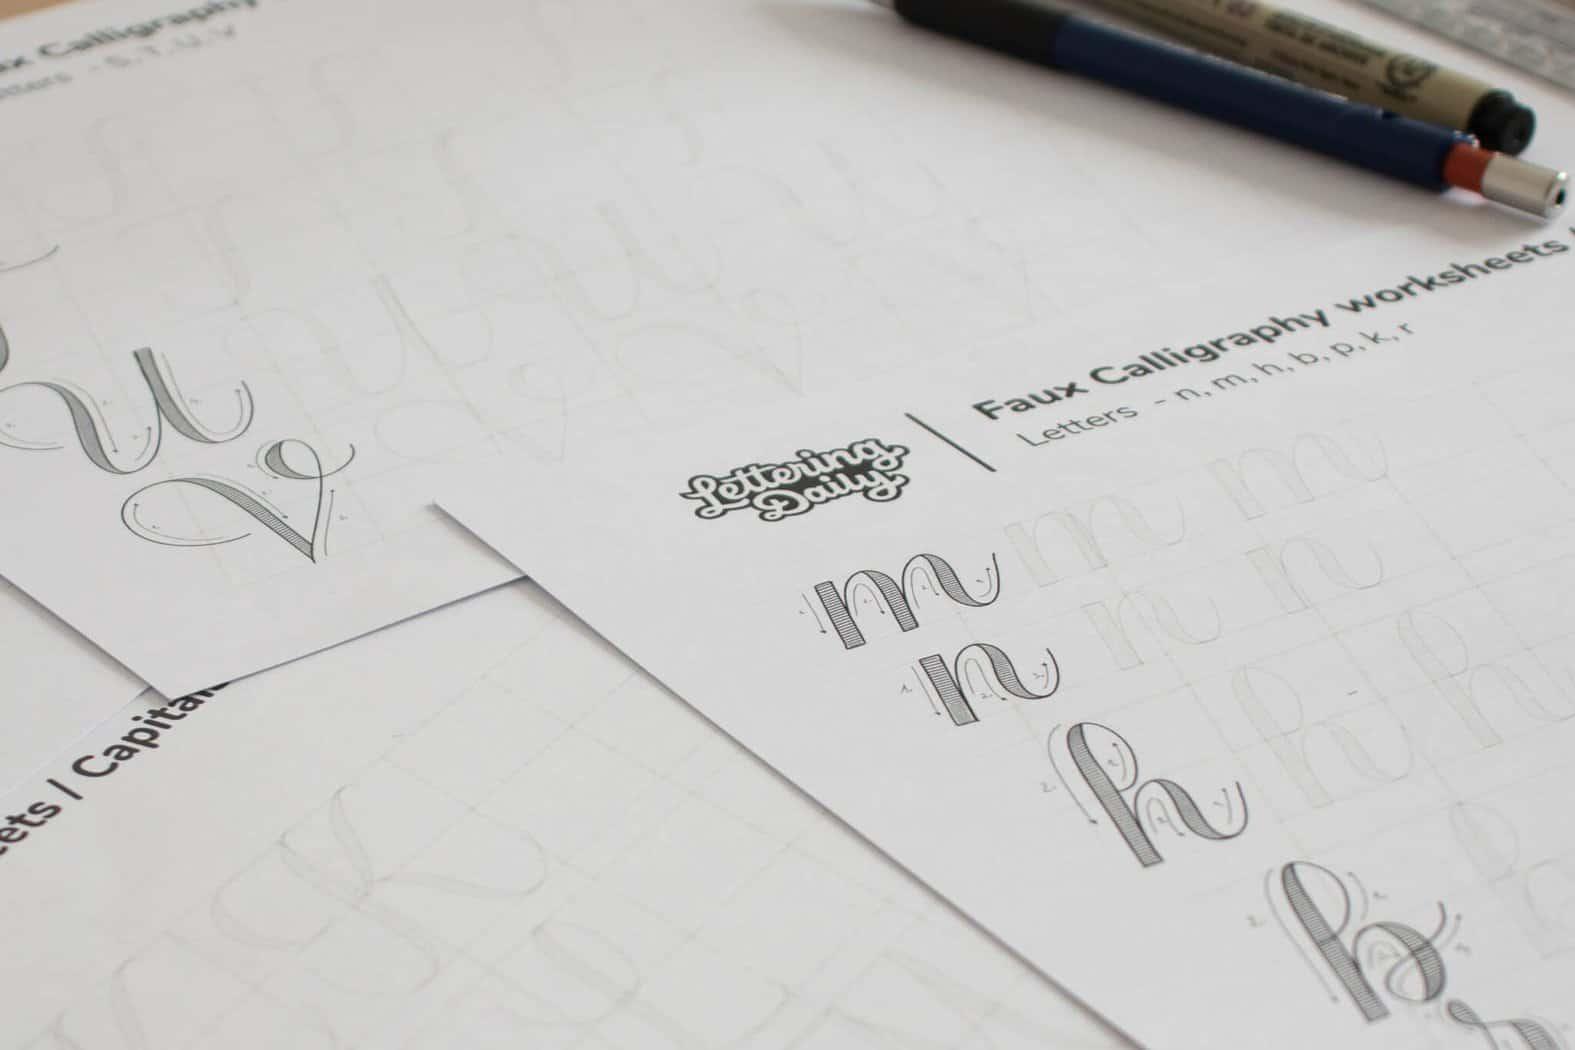 Improved brush pen image (2 of 3)